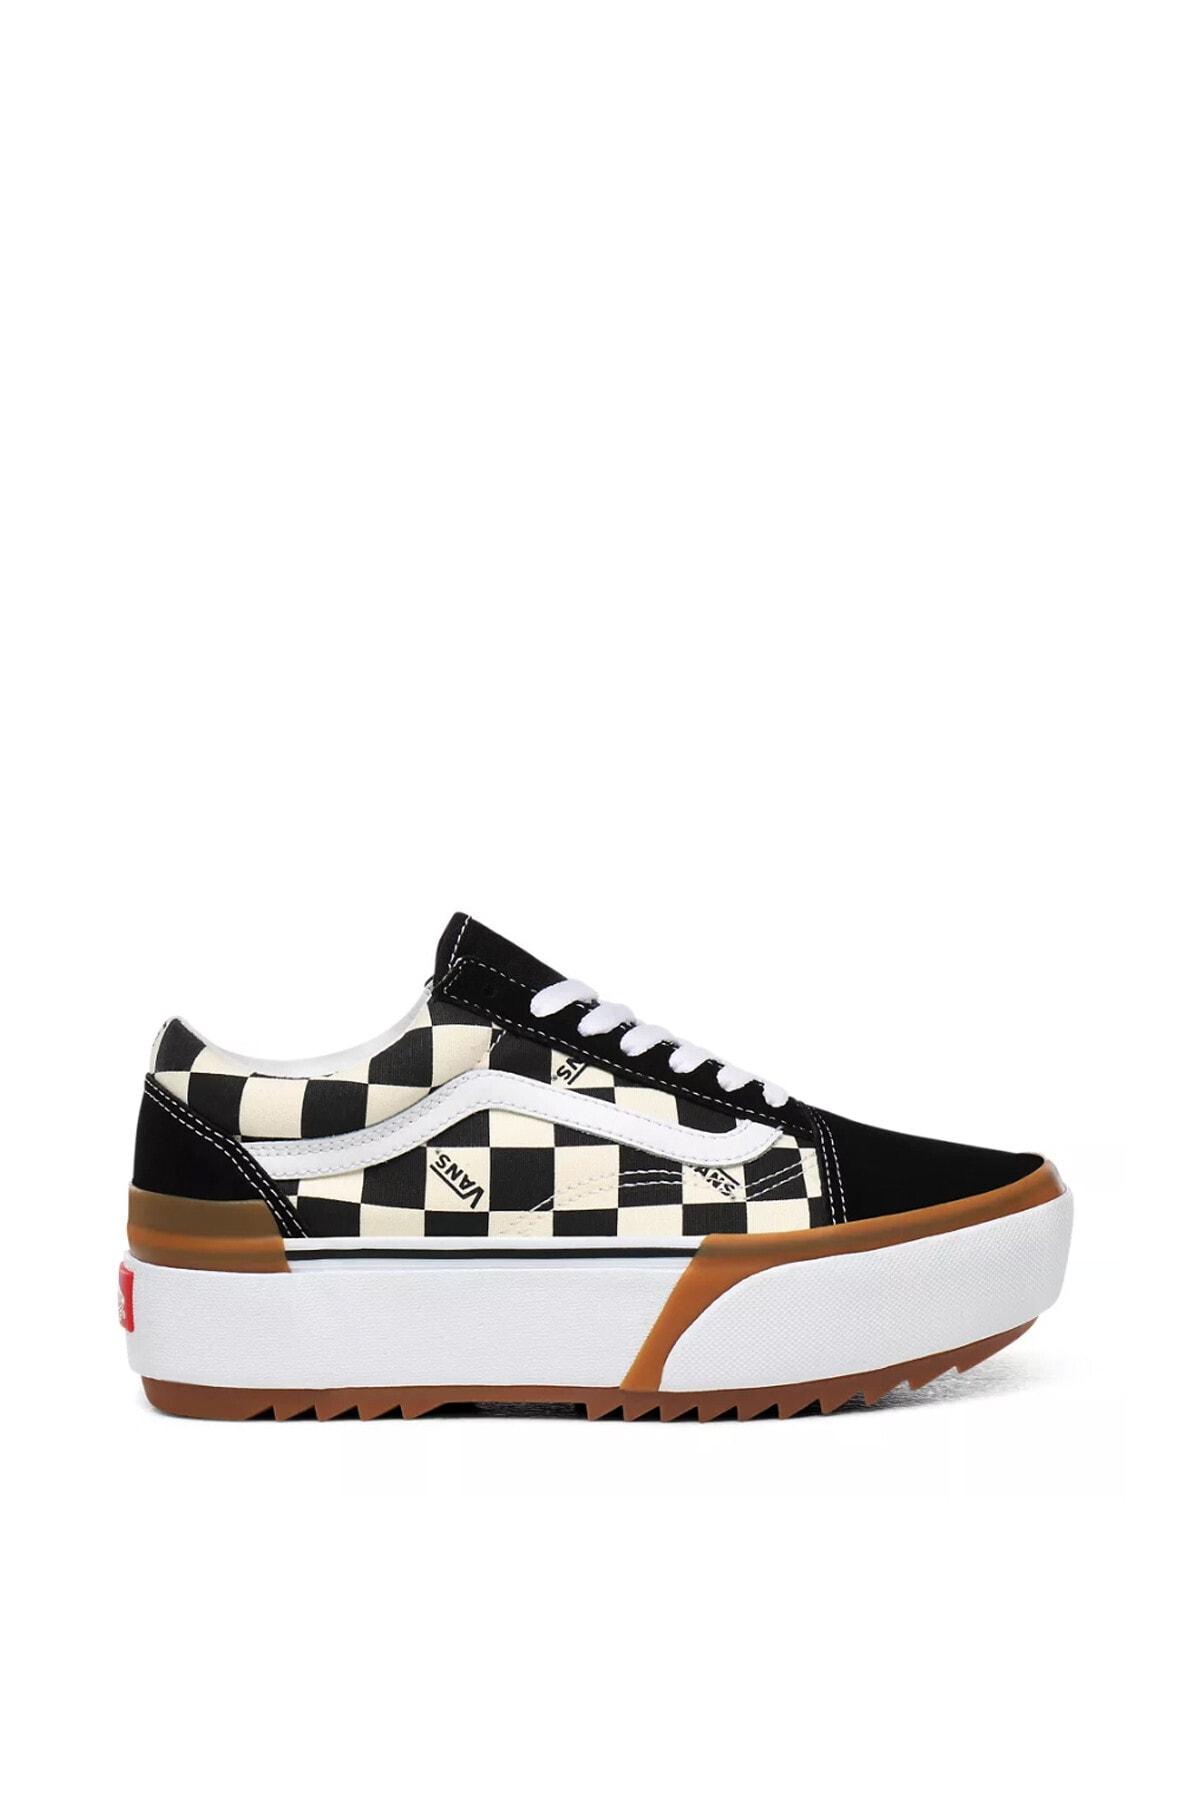 Vans Checkerboard Old Skool Stacked Kadın Ayakkabısı Vn0a4u15vlv1 1